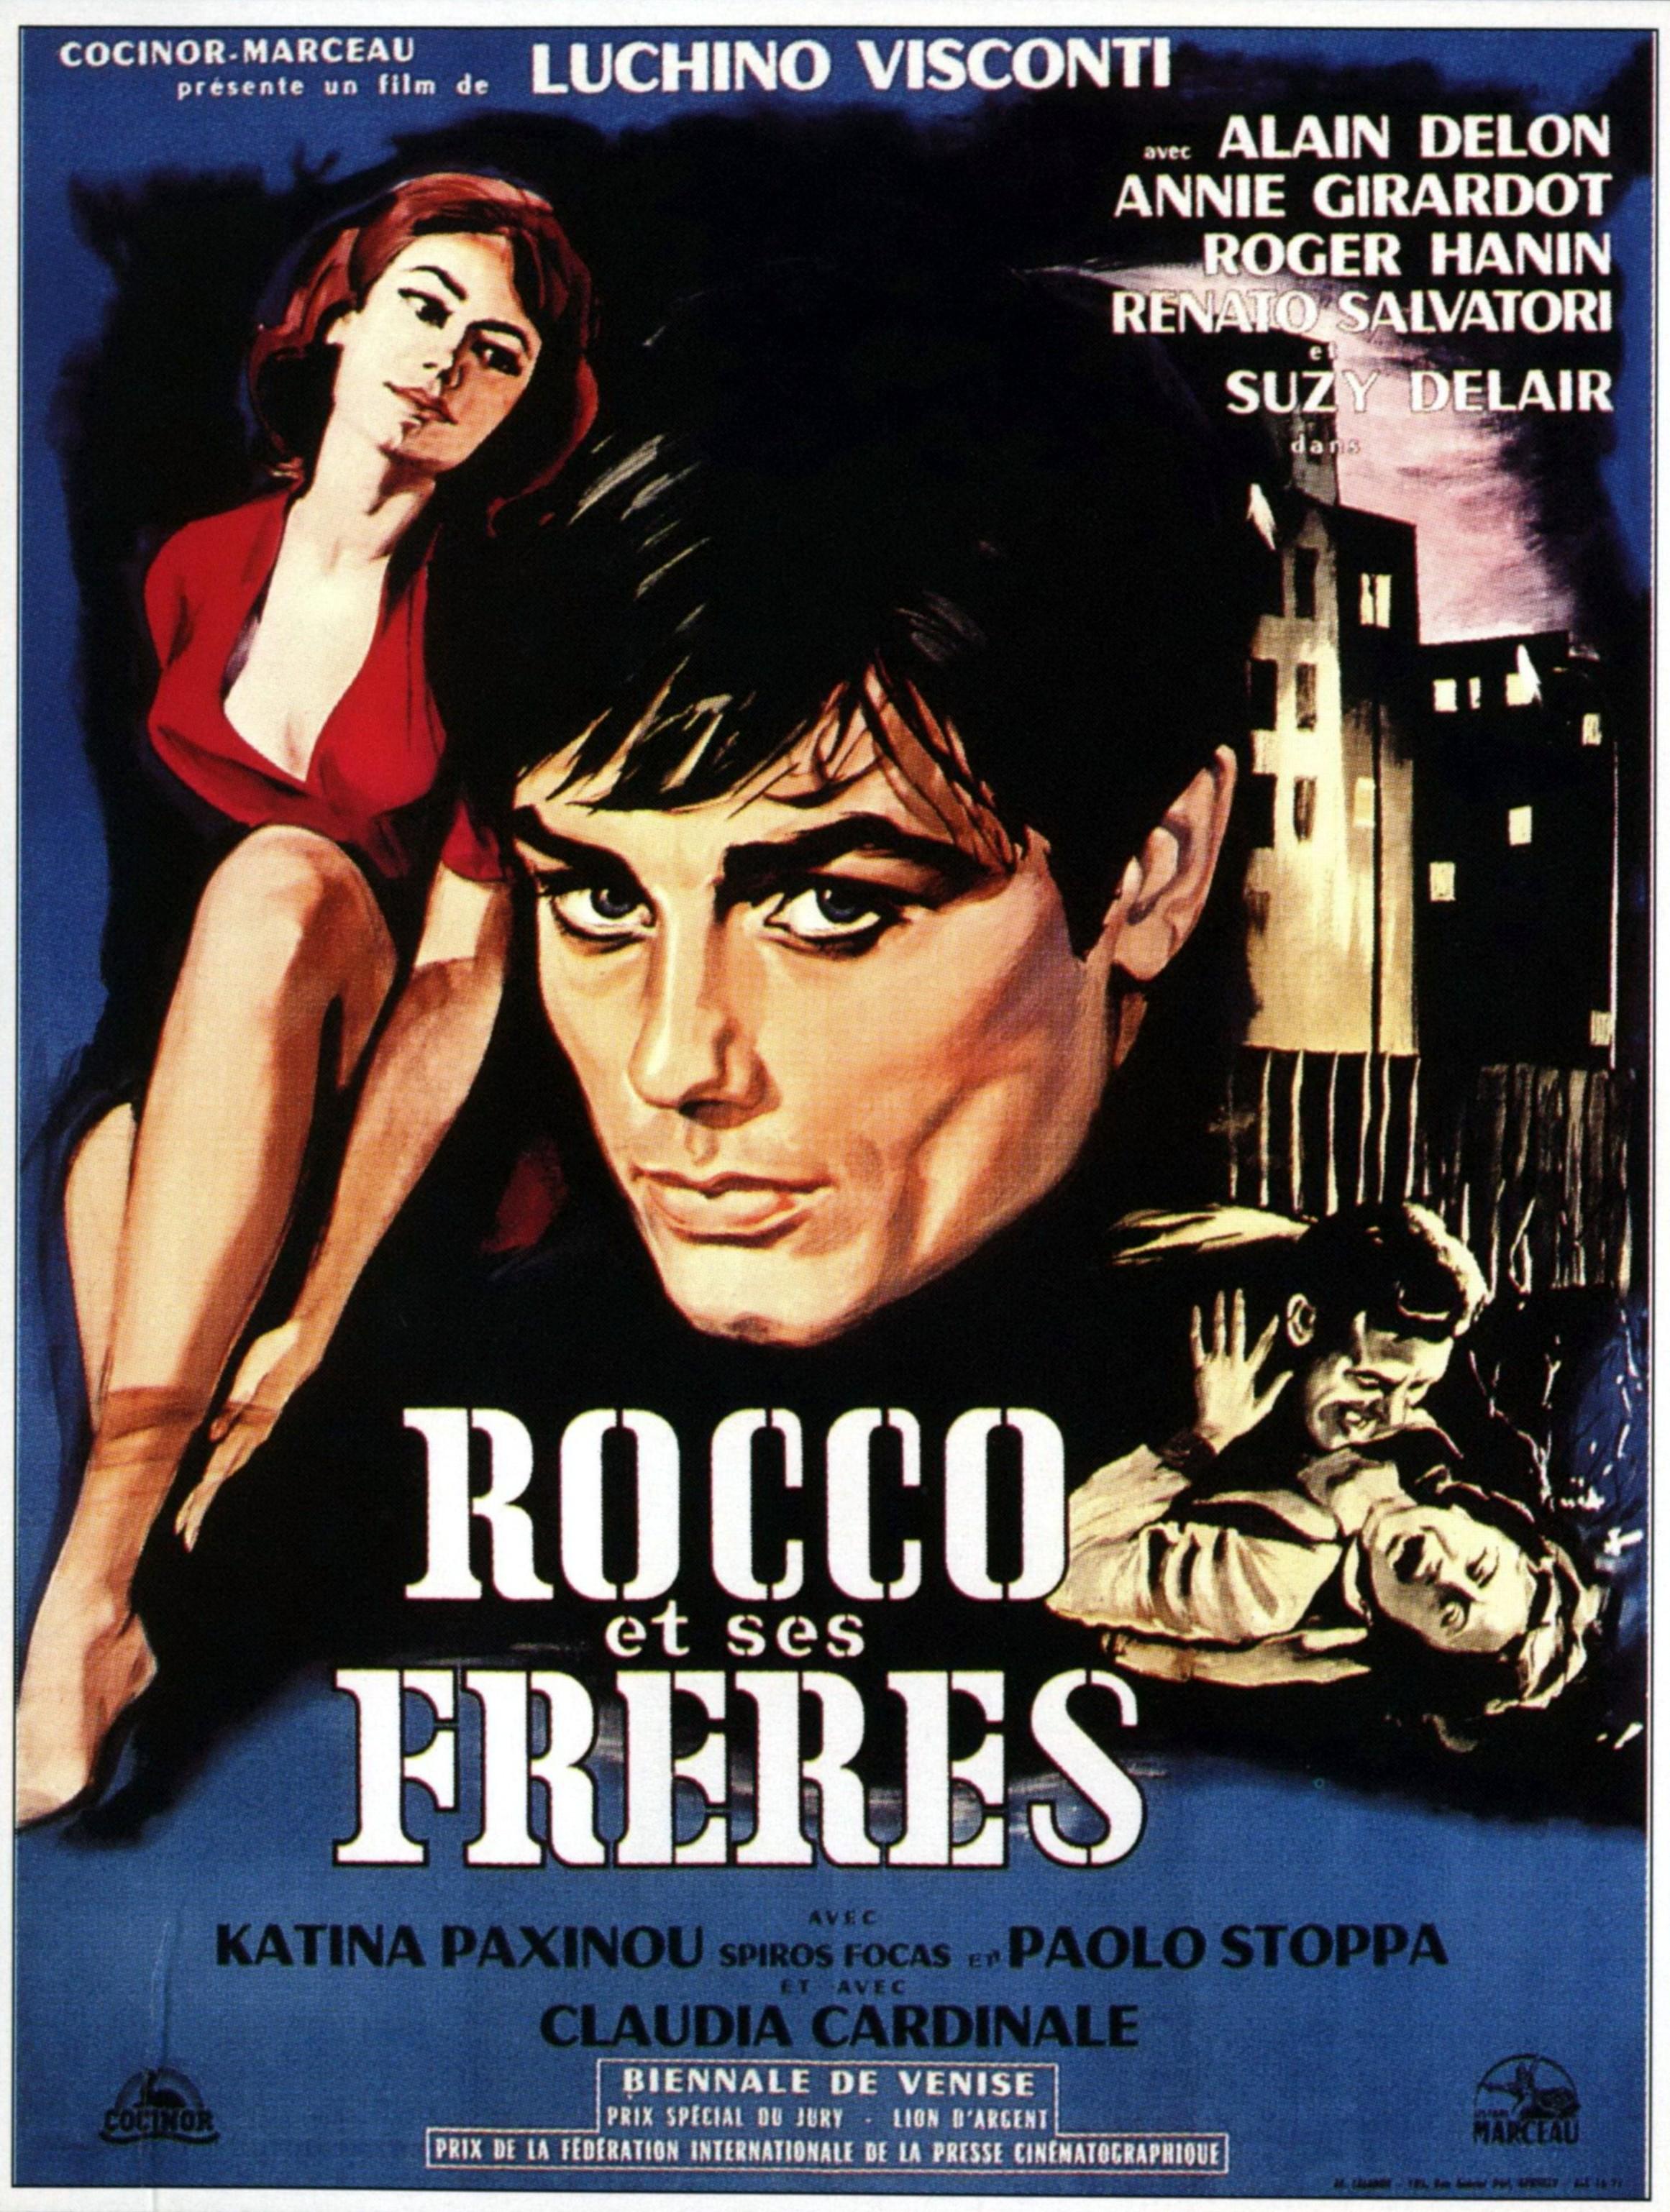 rocco et ses freres rocco e i suoi fratelli claudia cardinale box office 1961 box office story. Black Bedroom Furniture Sets. Home Design Ideas